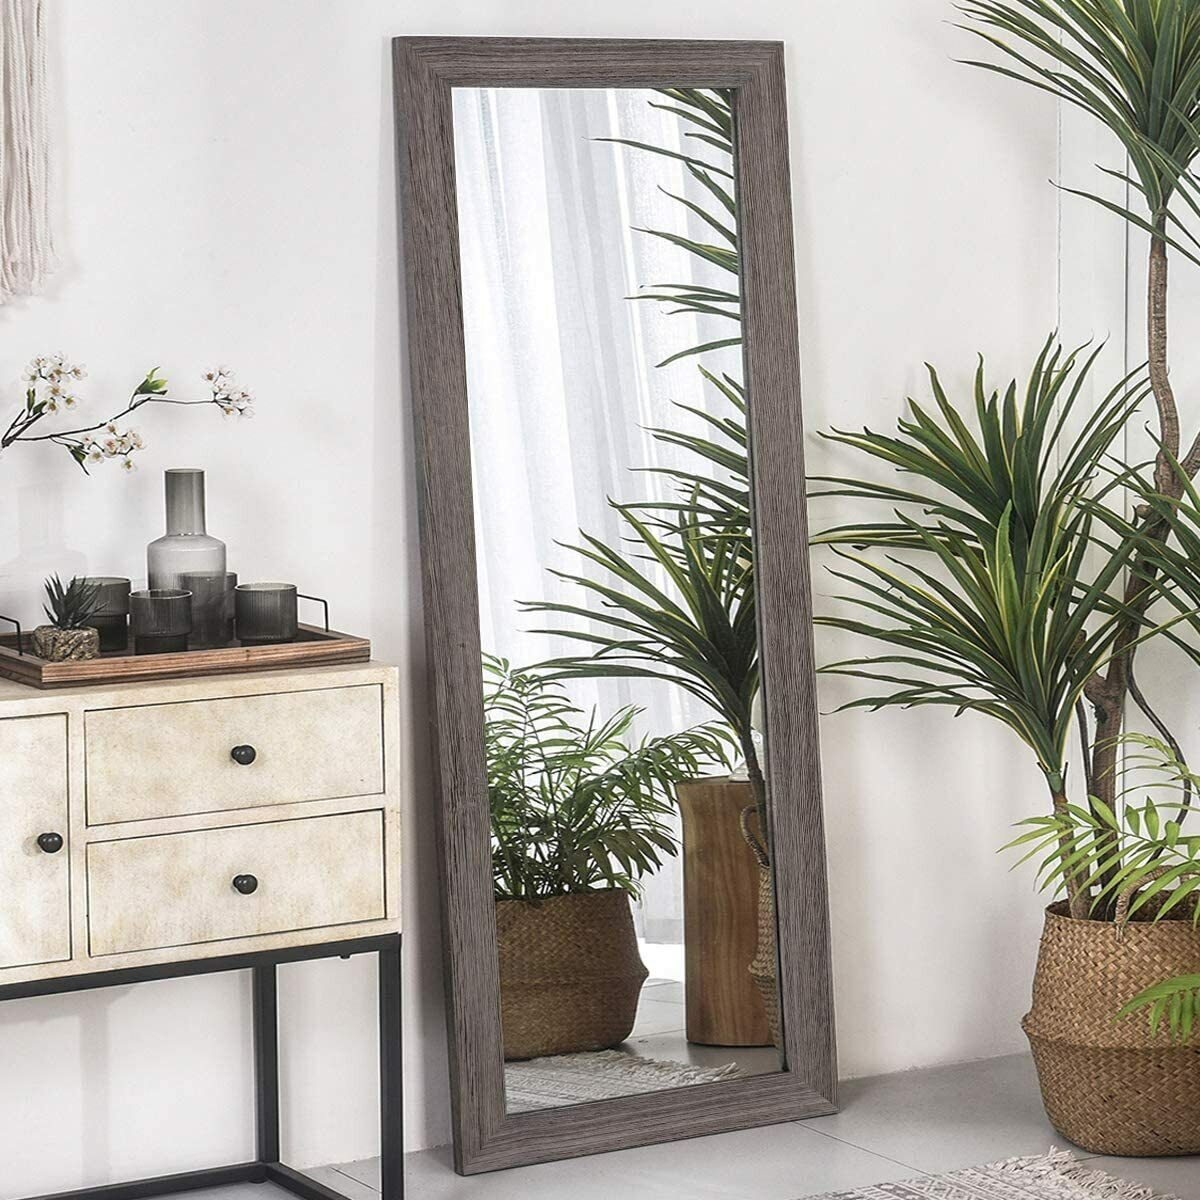 Union Rustic Jax Wall Mirror For Sale Online Ebay